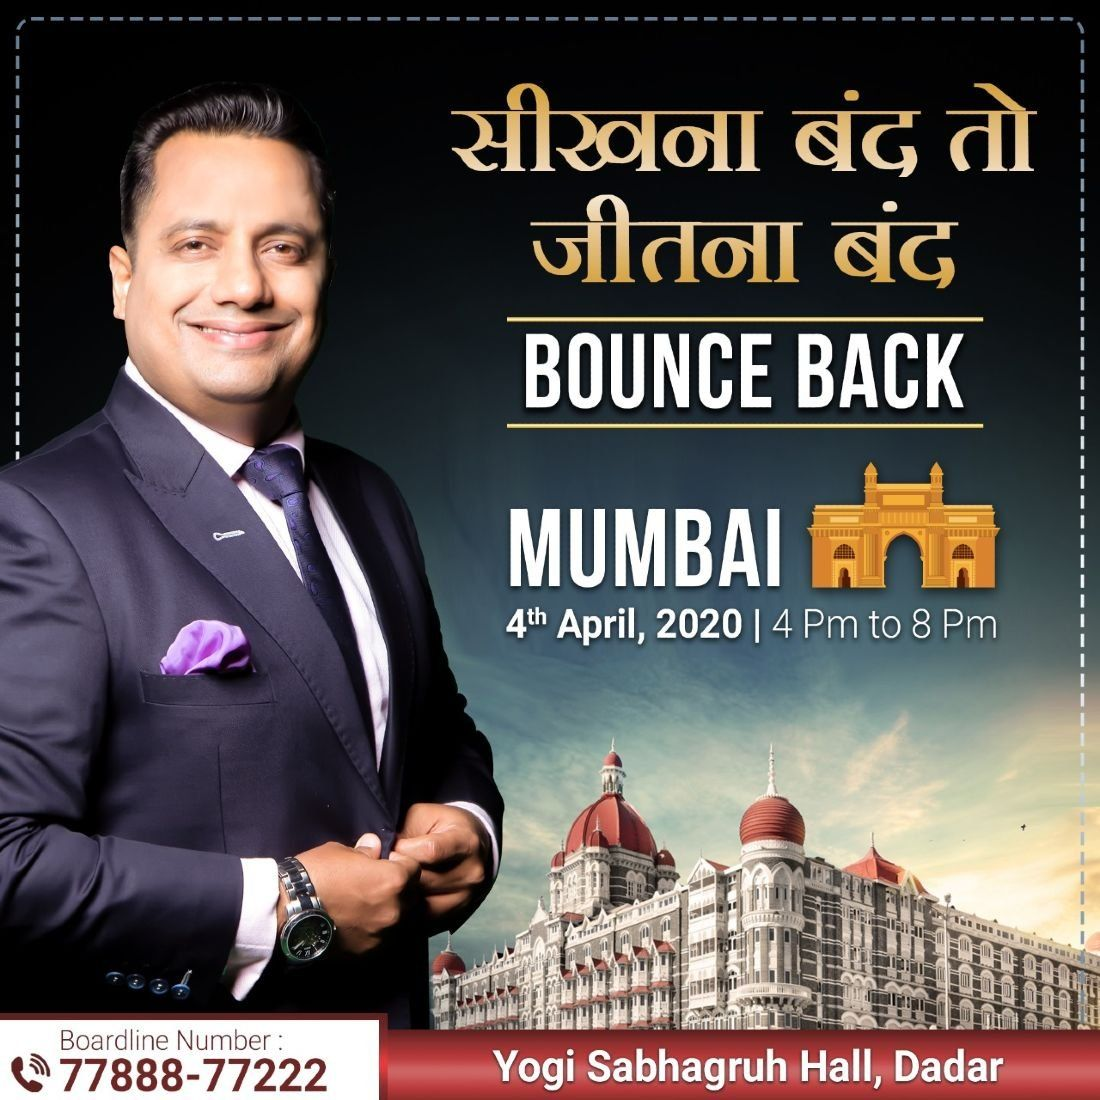 BOUNCE BACK MUMBAI BY DR. VIVEK BINDRA